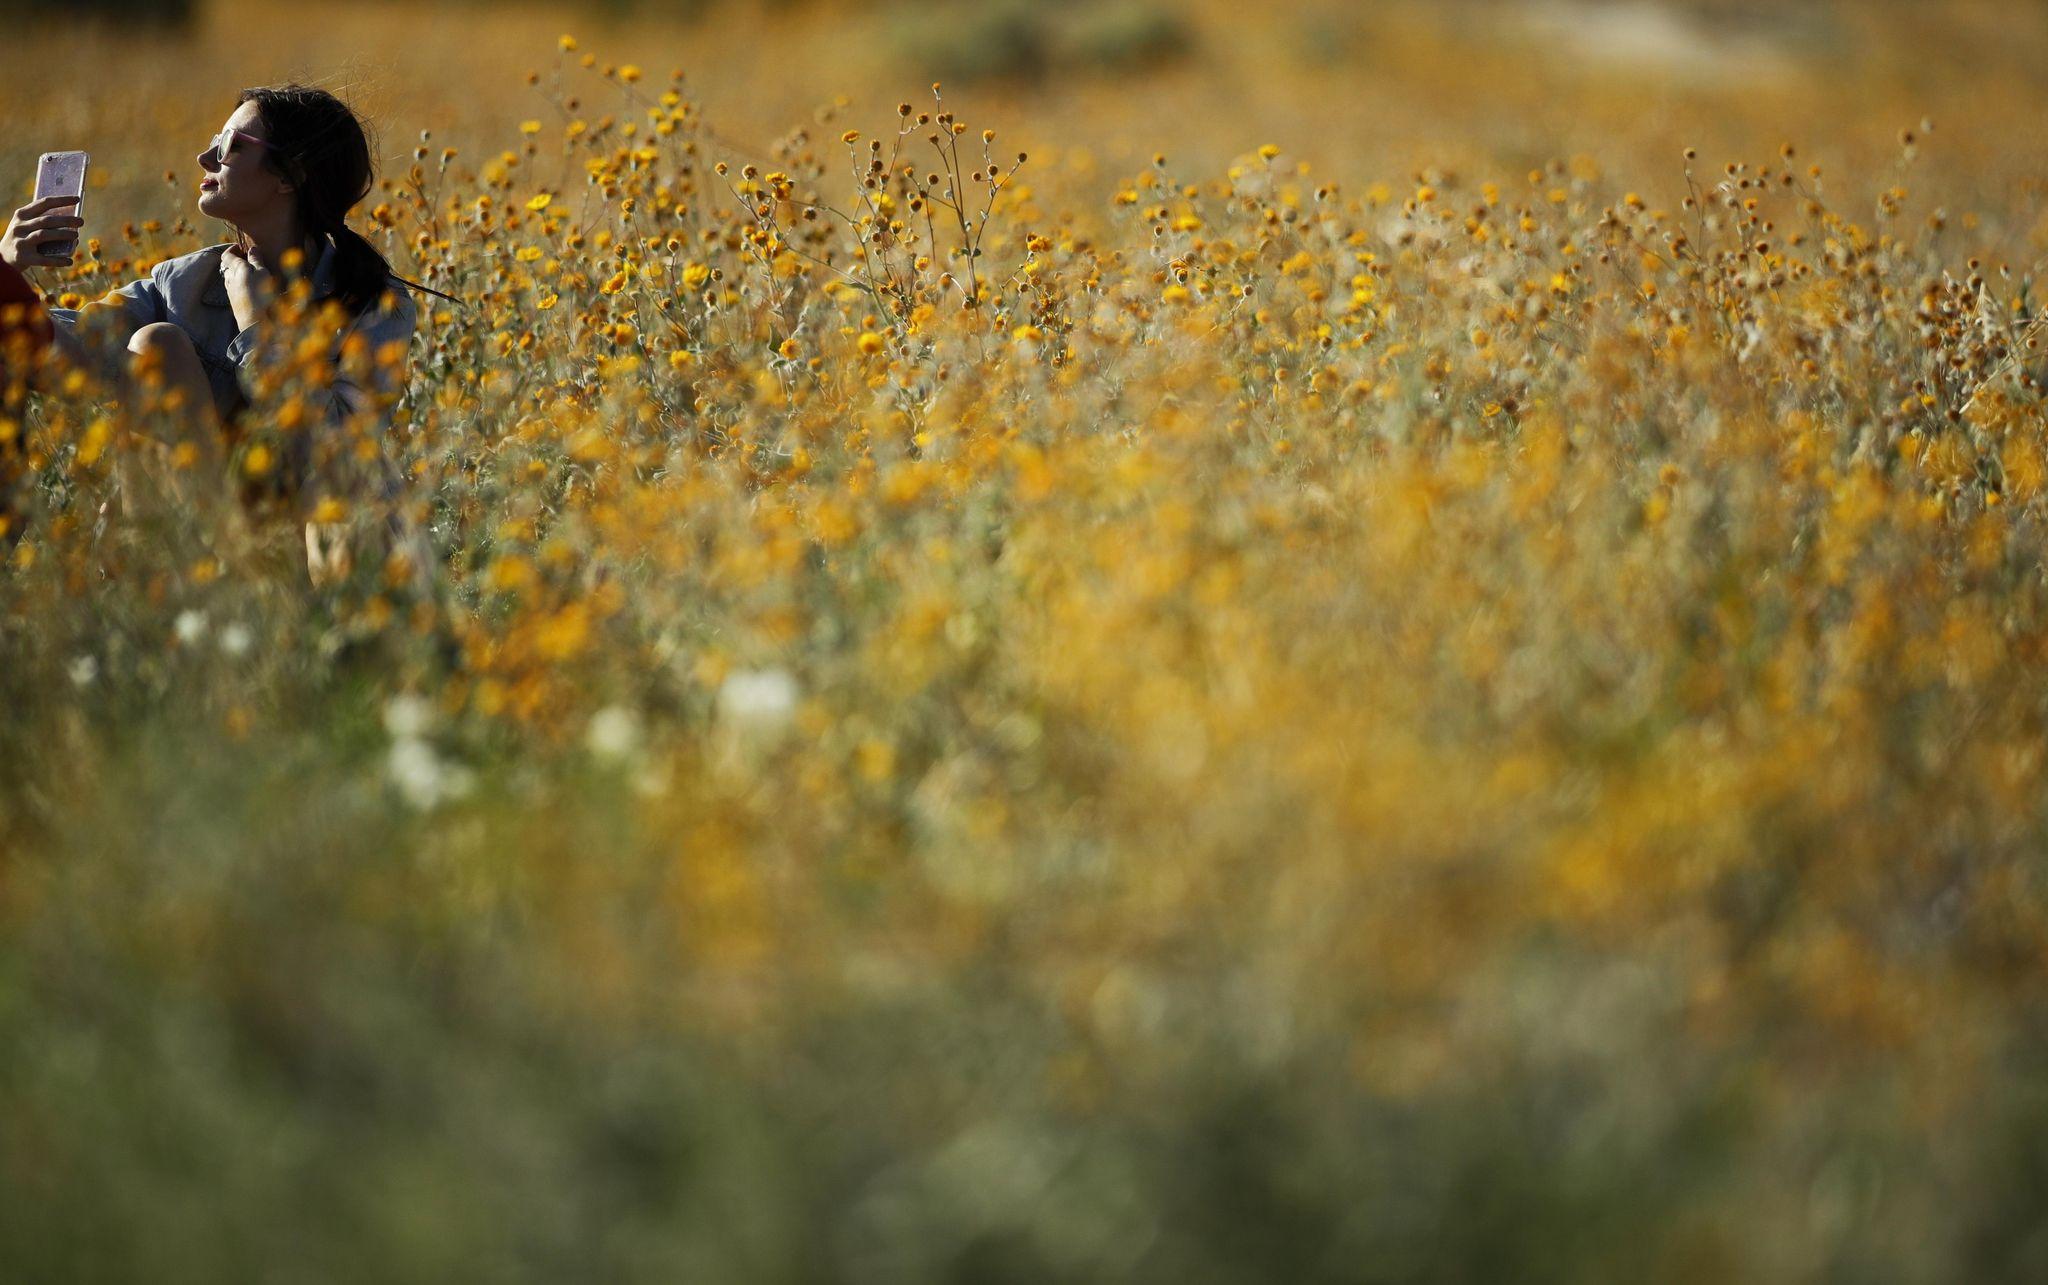 Californias Desert Wildflower Explosion Draws Record Crowds